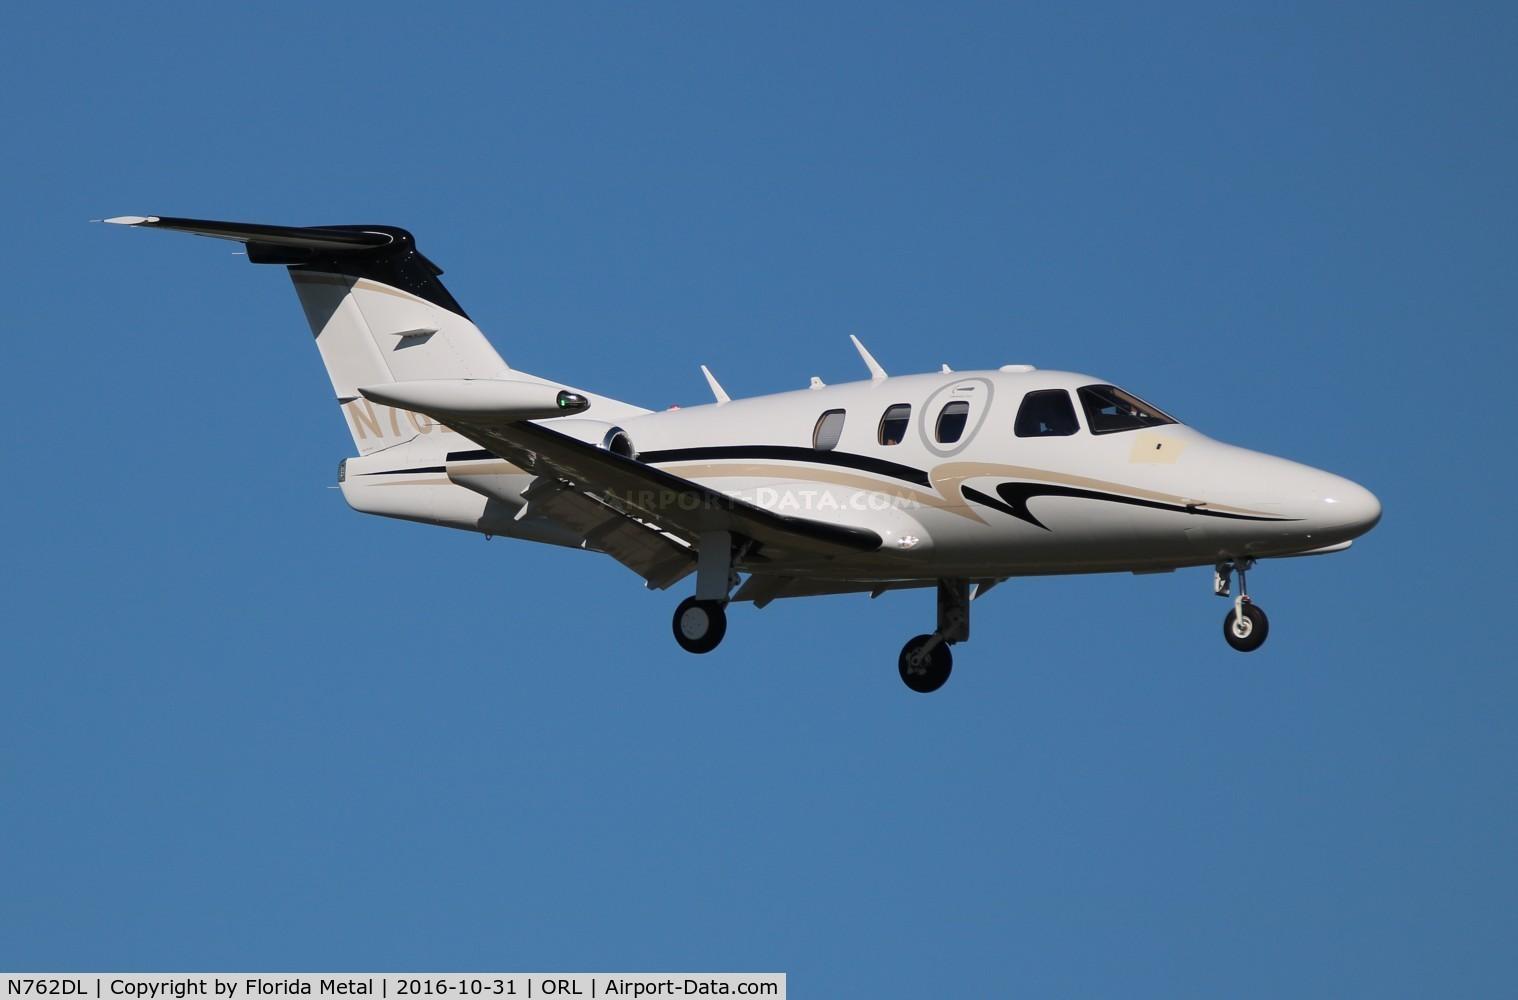 Aircraft N762DL (2008 Eclipse Aviation Corp EA500 C/N 000215